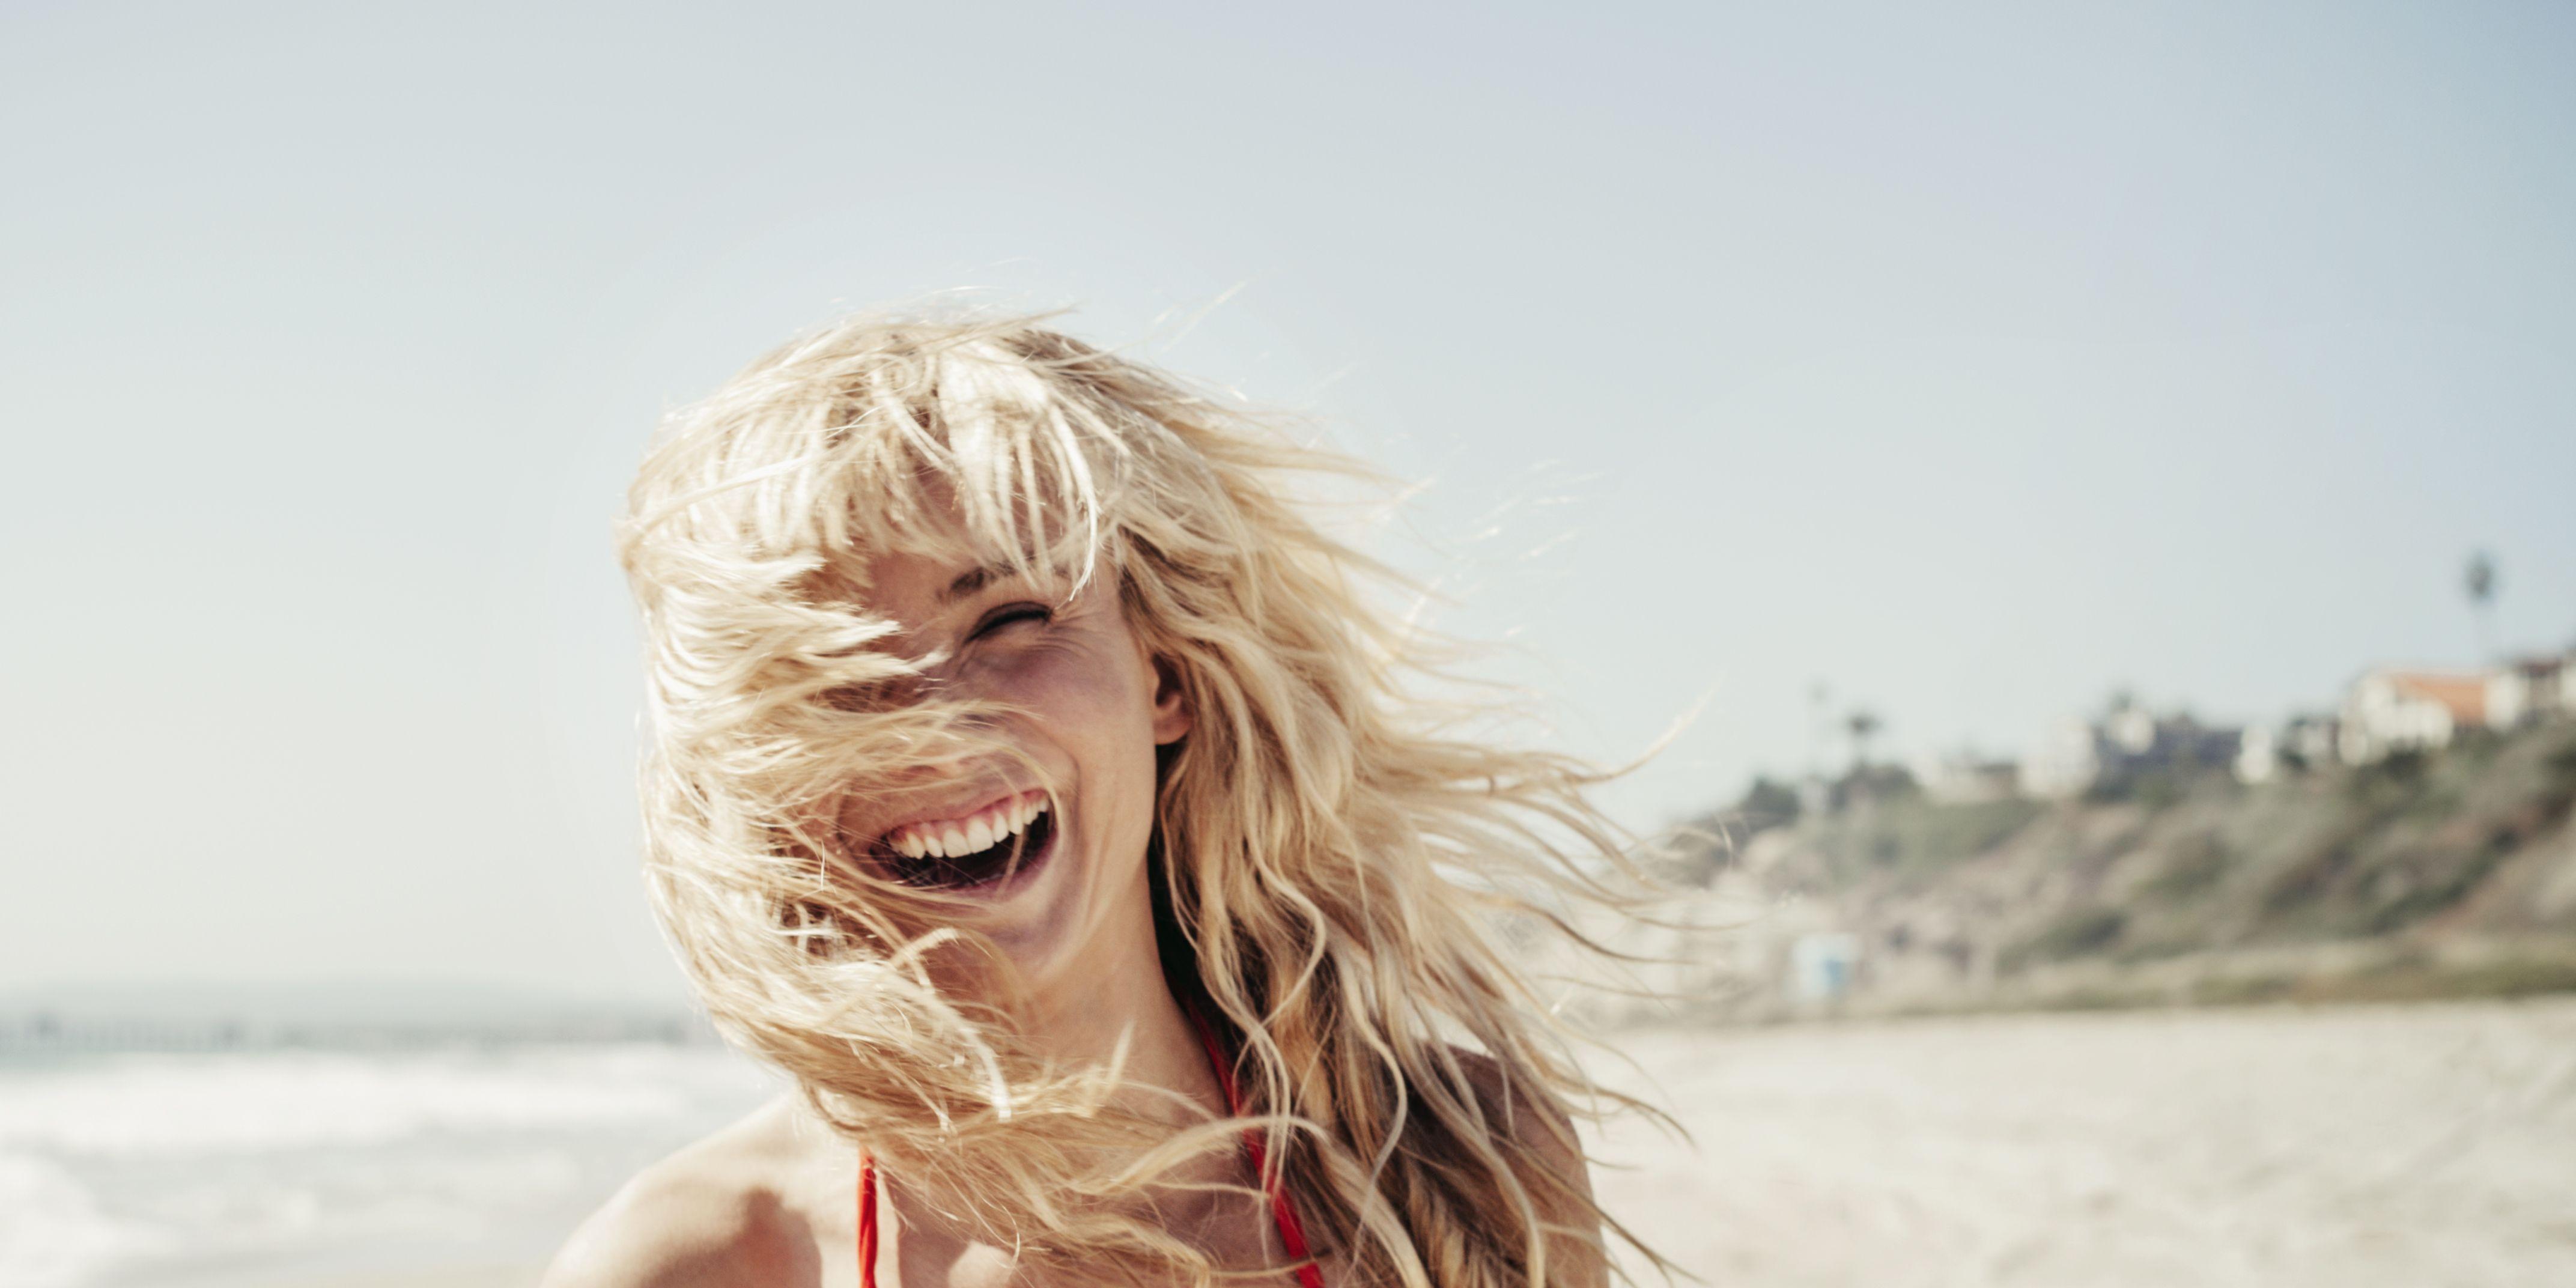 best sun lotion for face - women's health uk